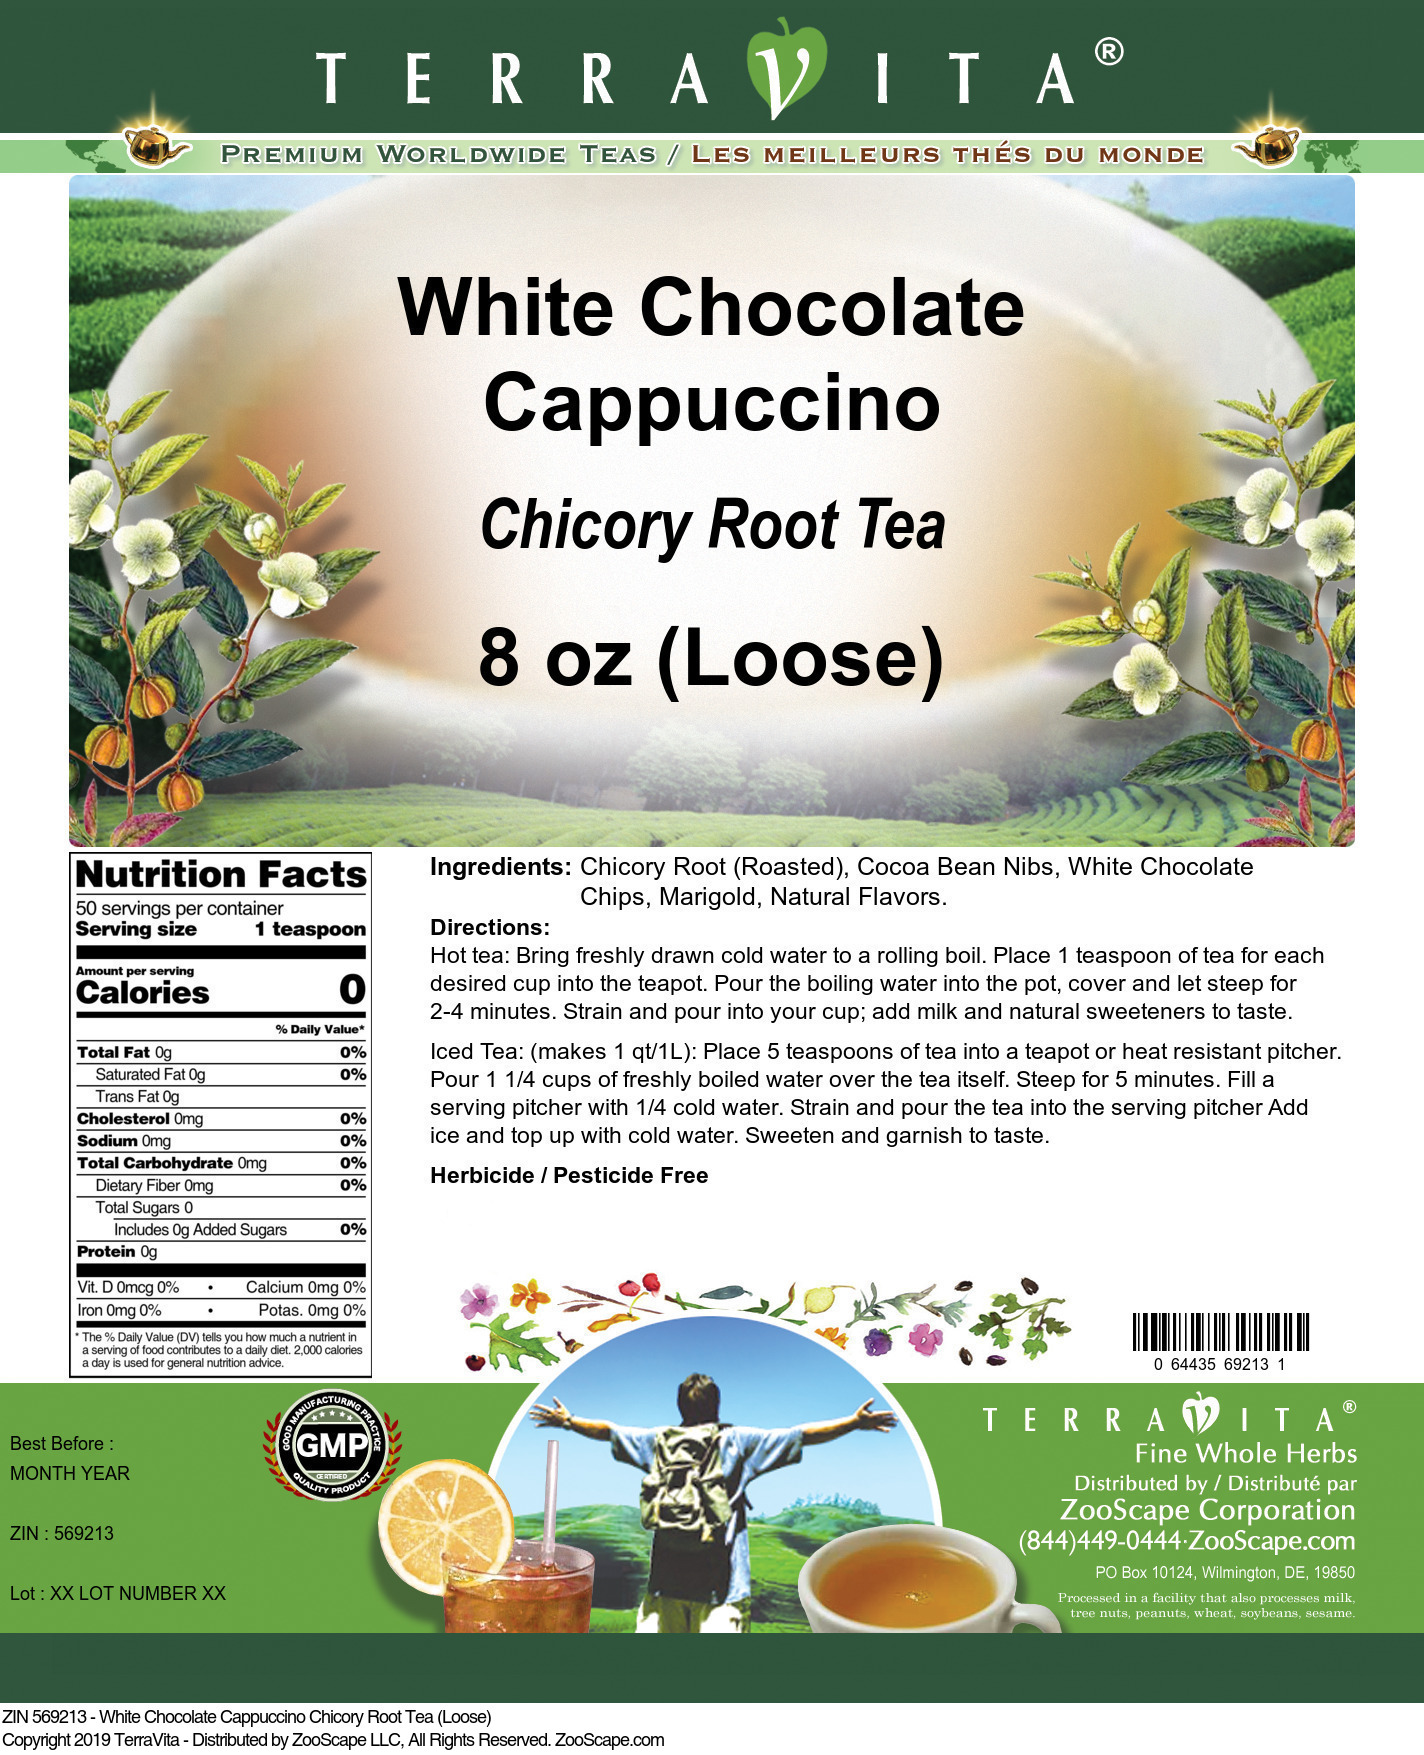 White Chocolate Cappuccino Chicory Root Tea (Loose)